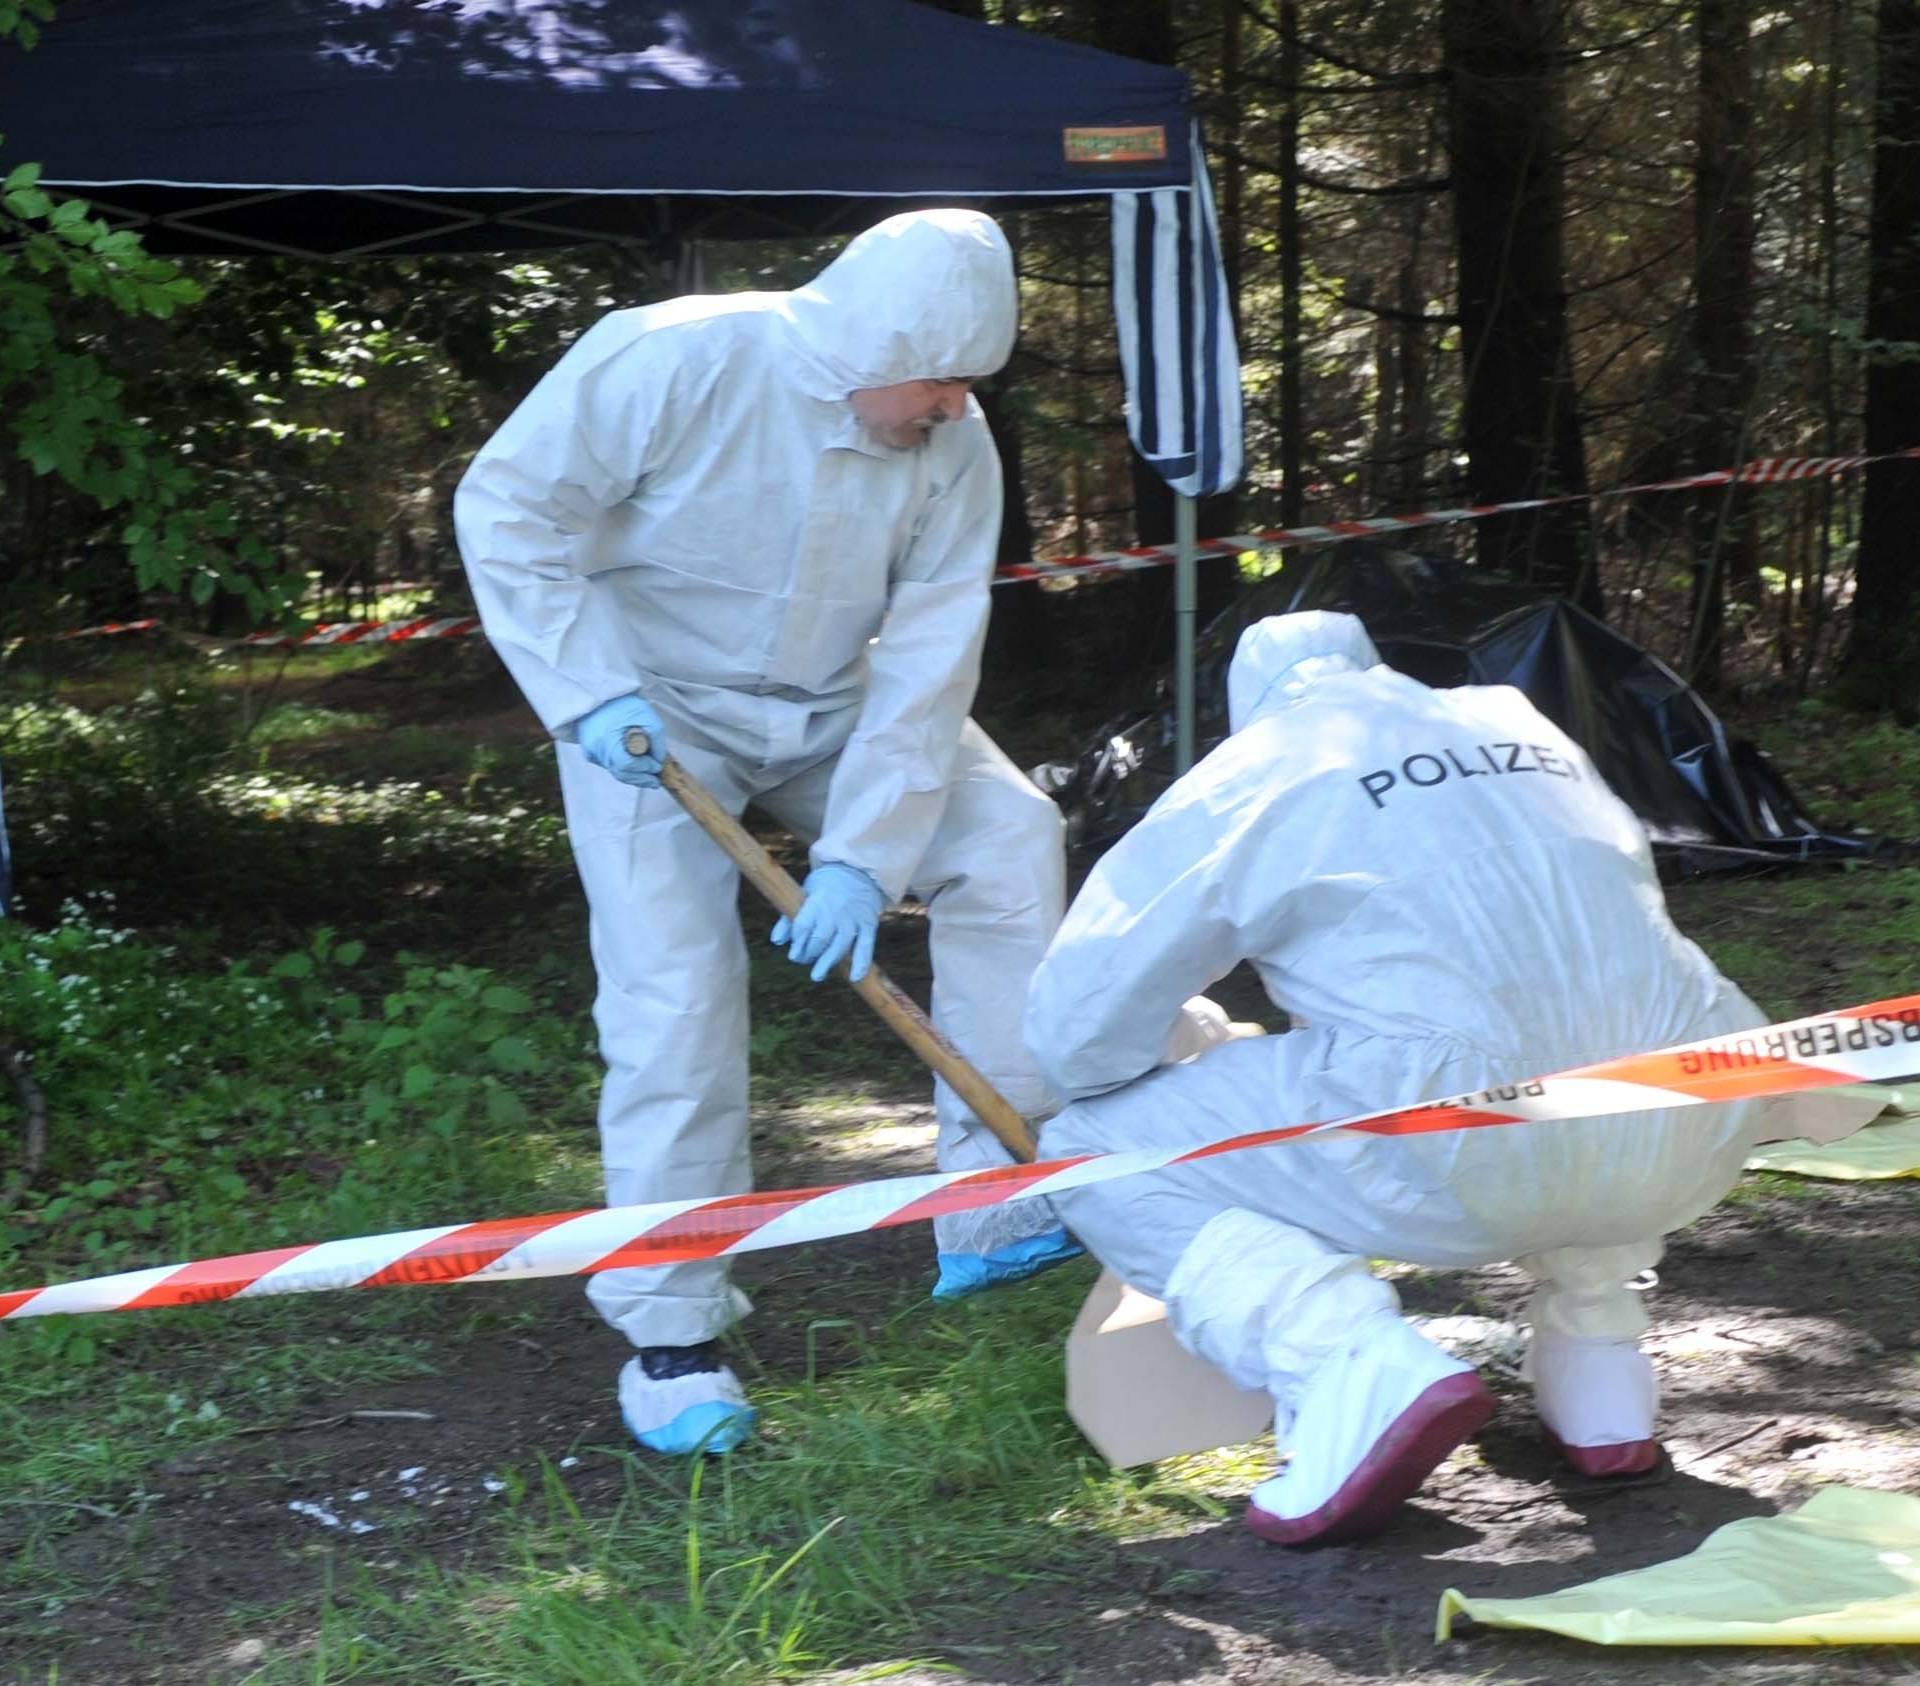 Female body found in Heidenheim